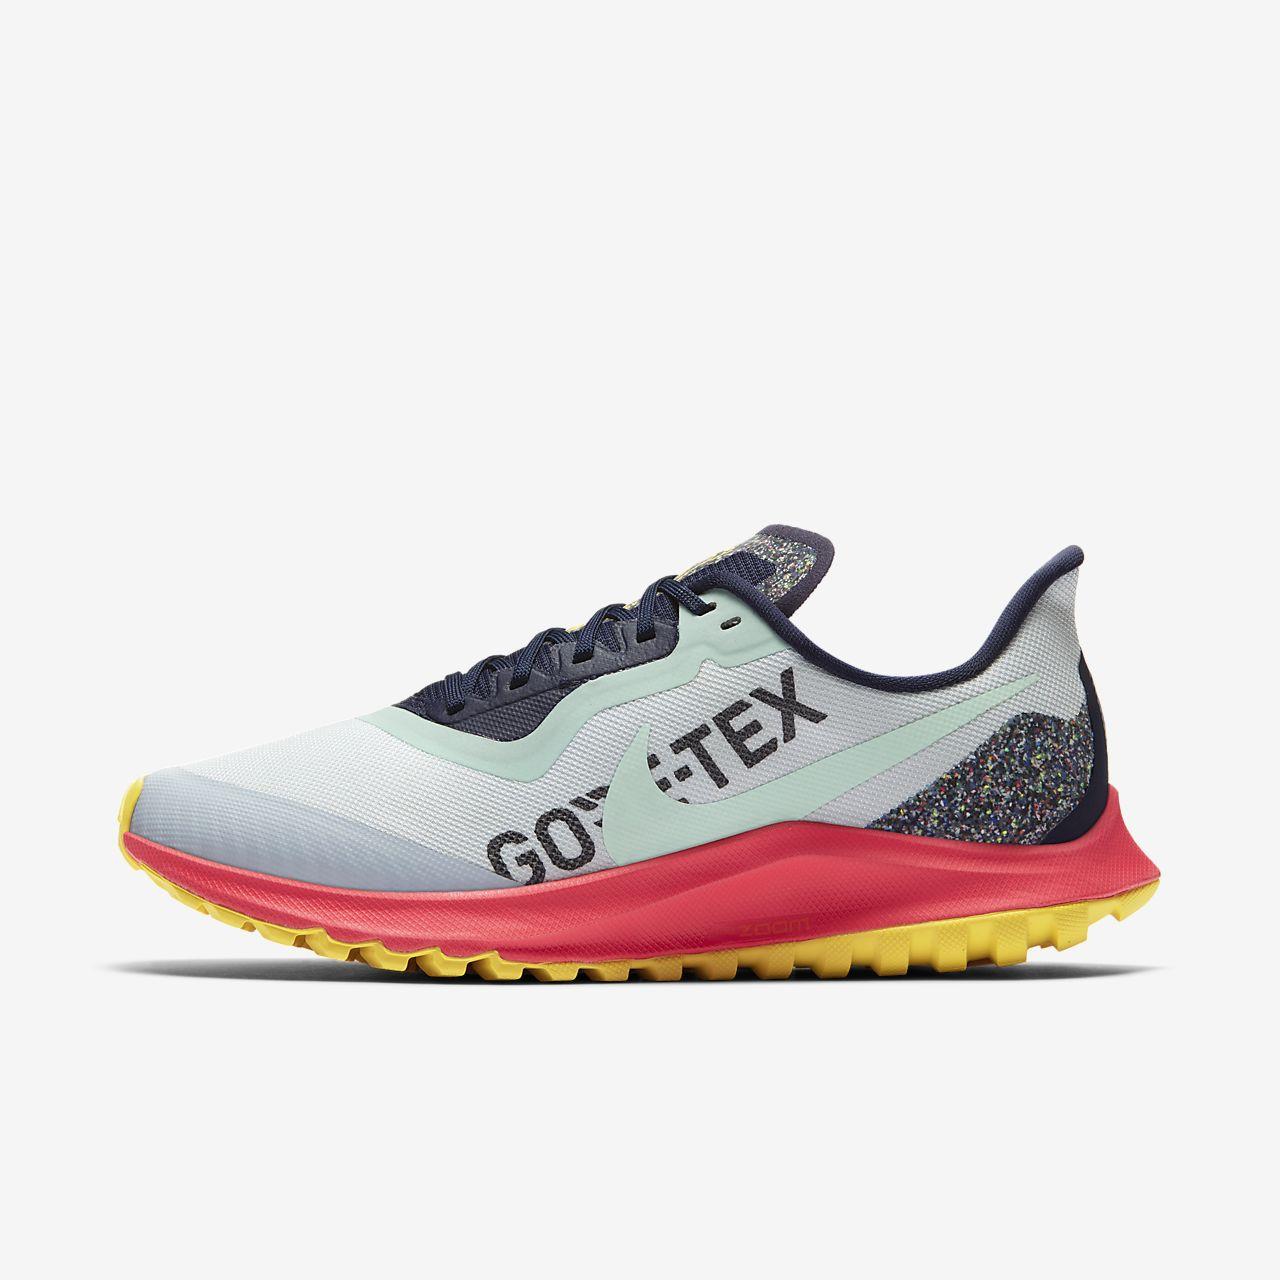 Calzado de trail running para mujer Nike Air Zoom Pegasus 36 Trail GORE-TEX